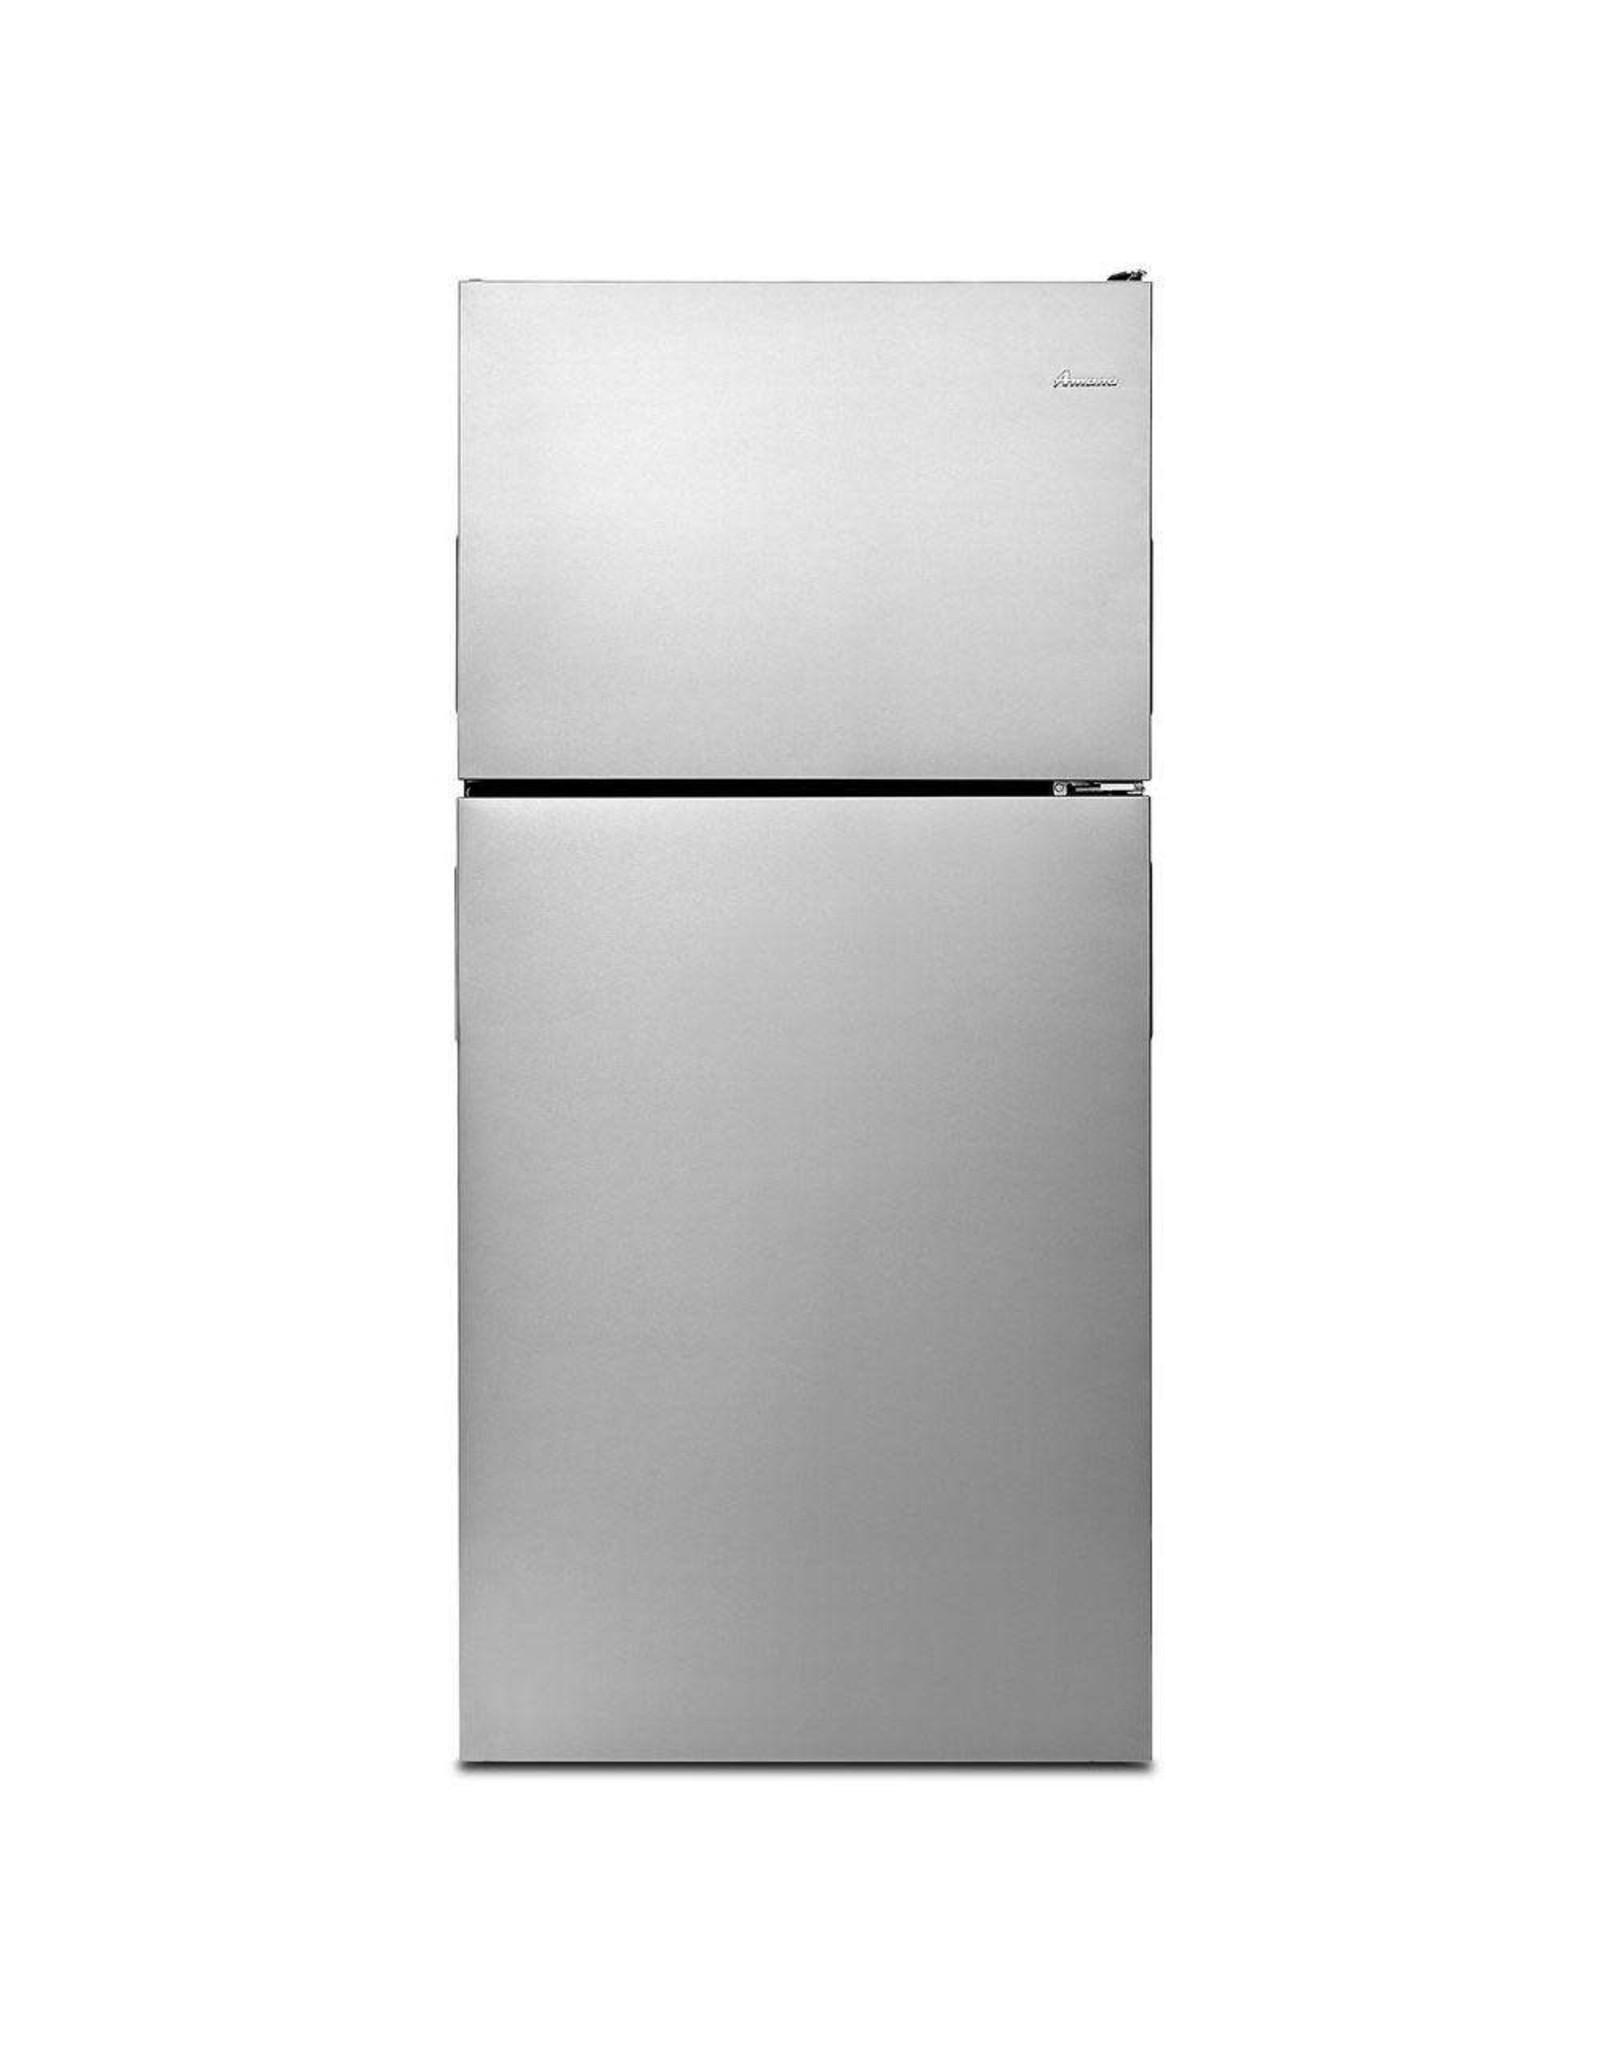 ART308FFDM AMA No Frost Top - Free Standing Refr Frez - 18 CU FT; STD ENERGY/WIRE RC; SEMI-SMOOT